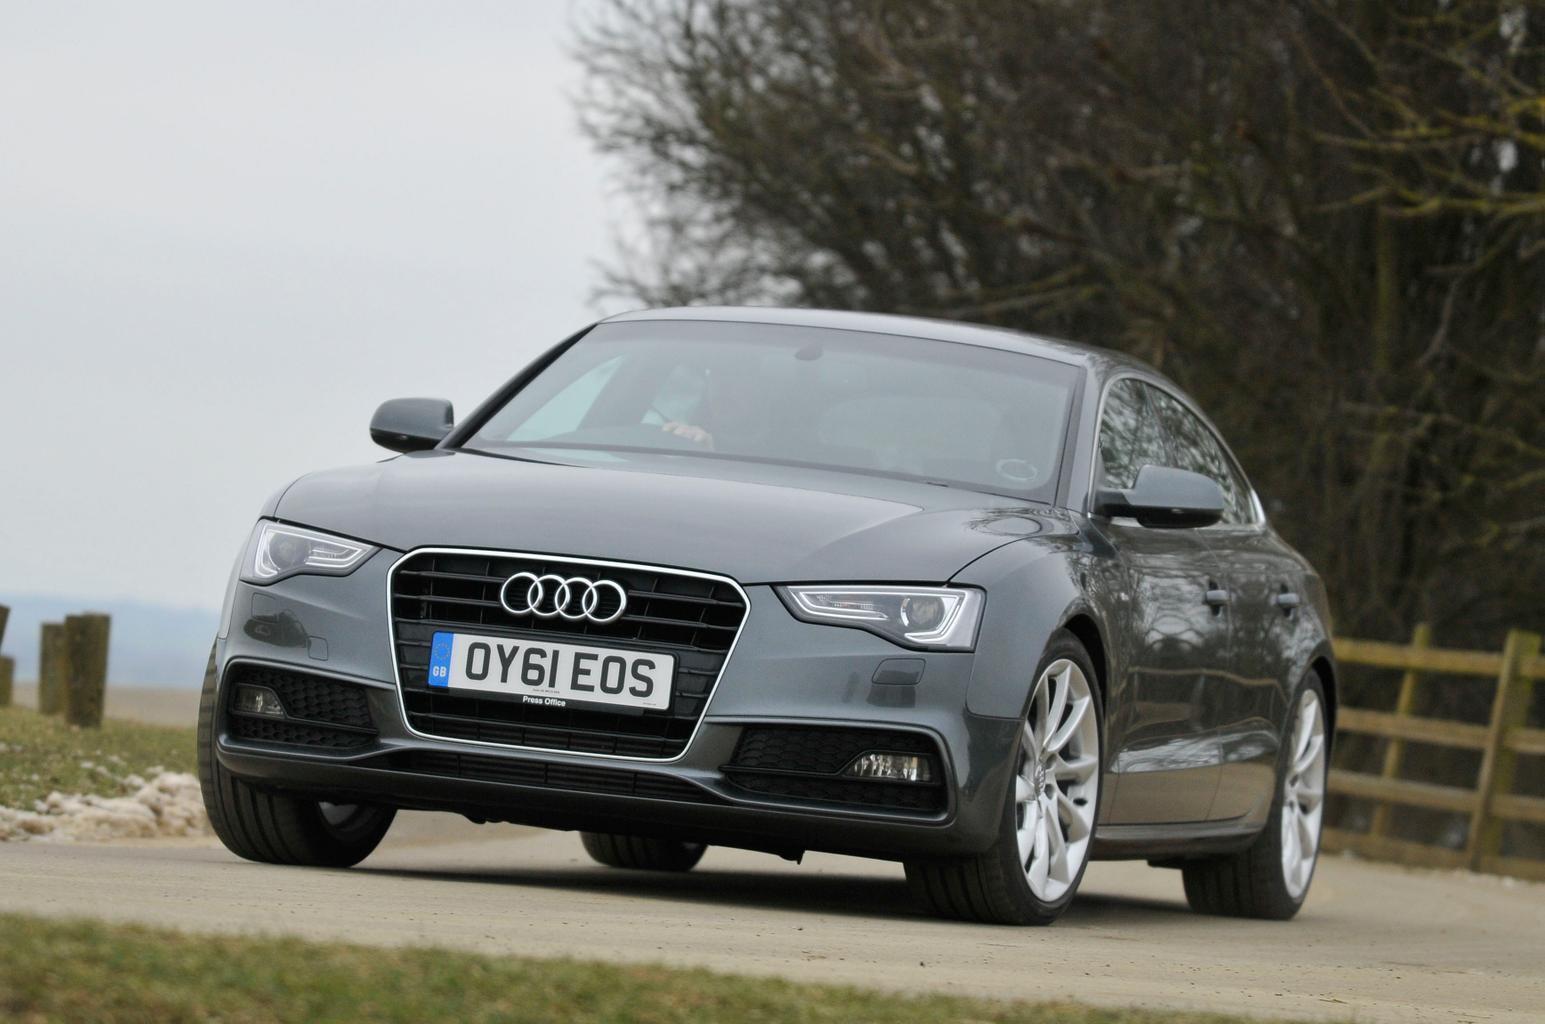 Used test: Audi A5 Sportback vs Chevrolet Volt vs Range Rover Evoque